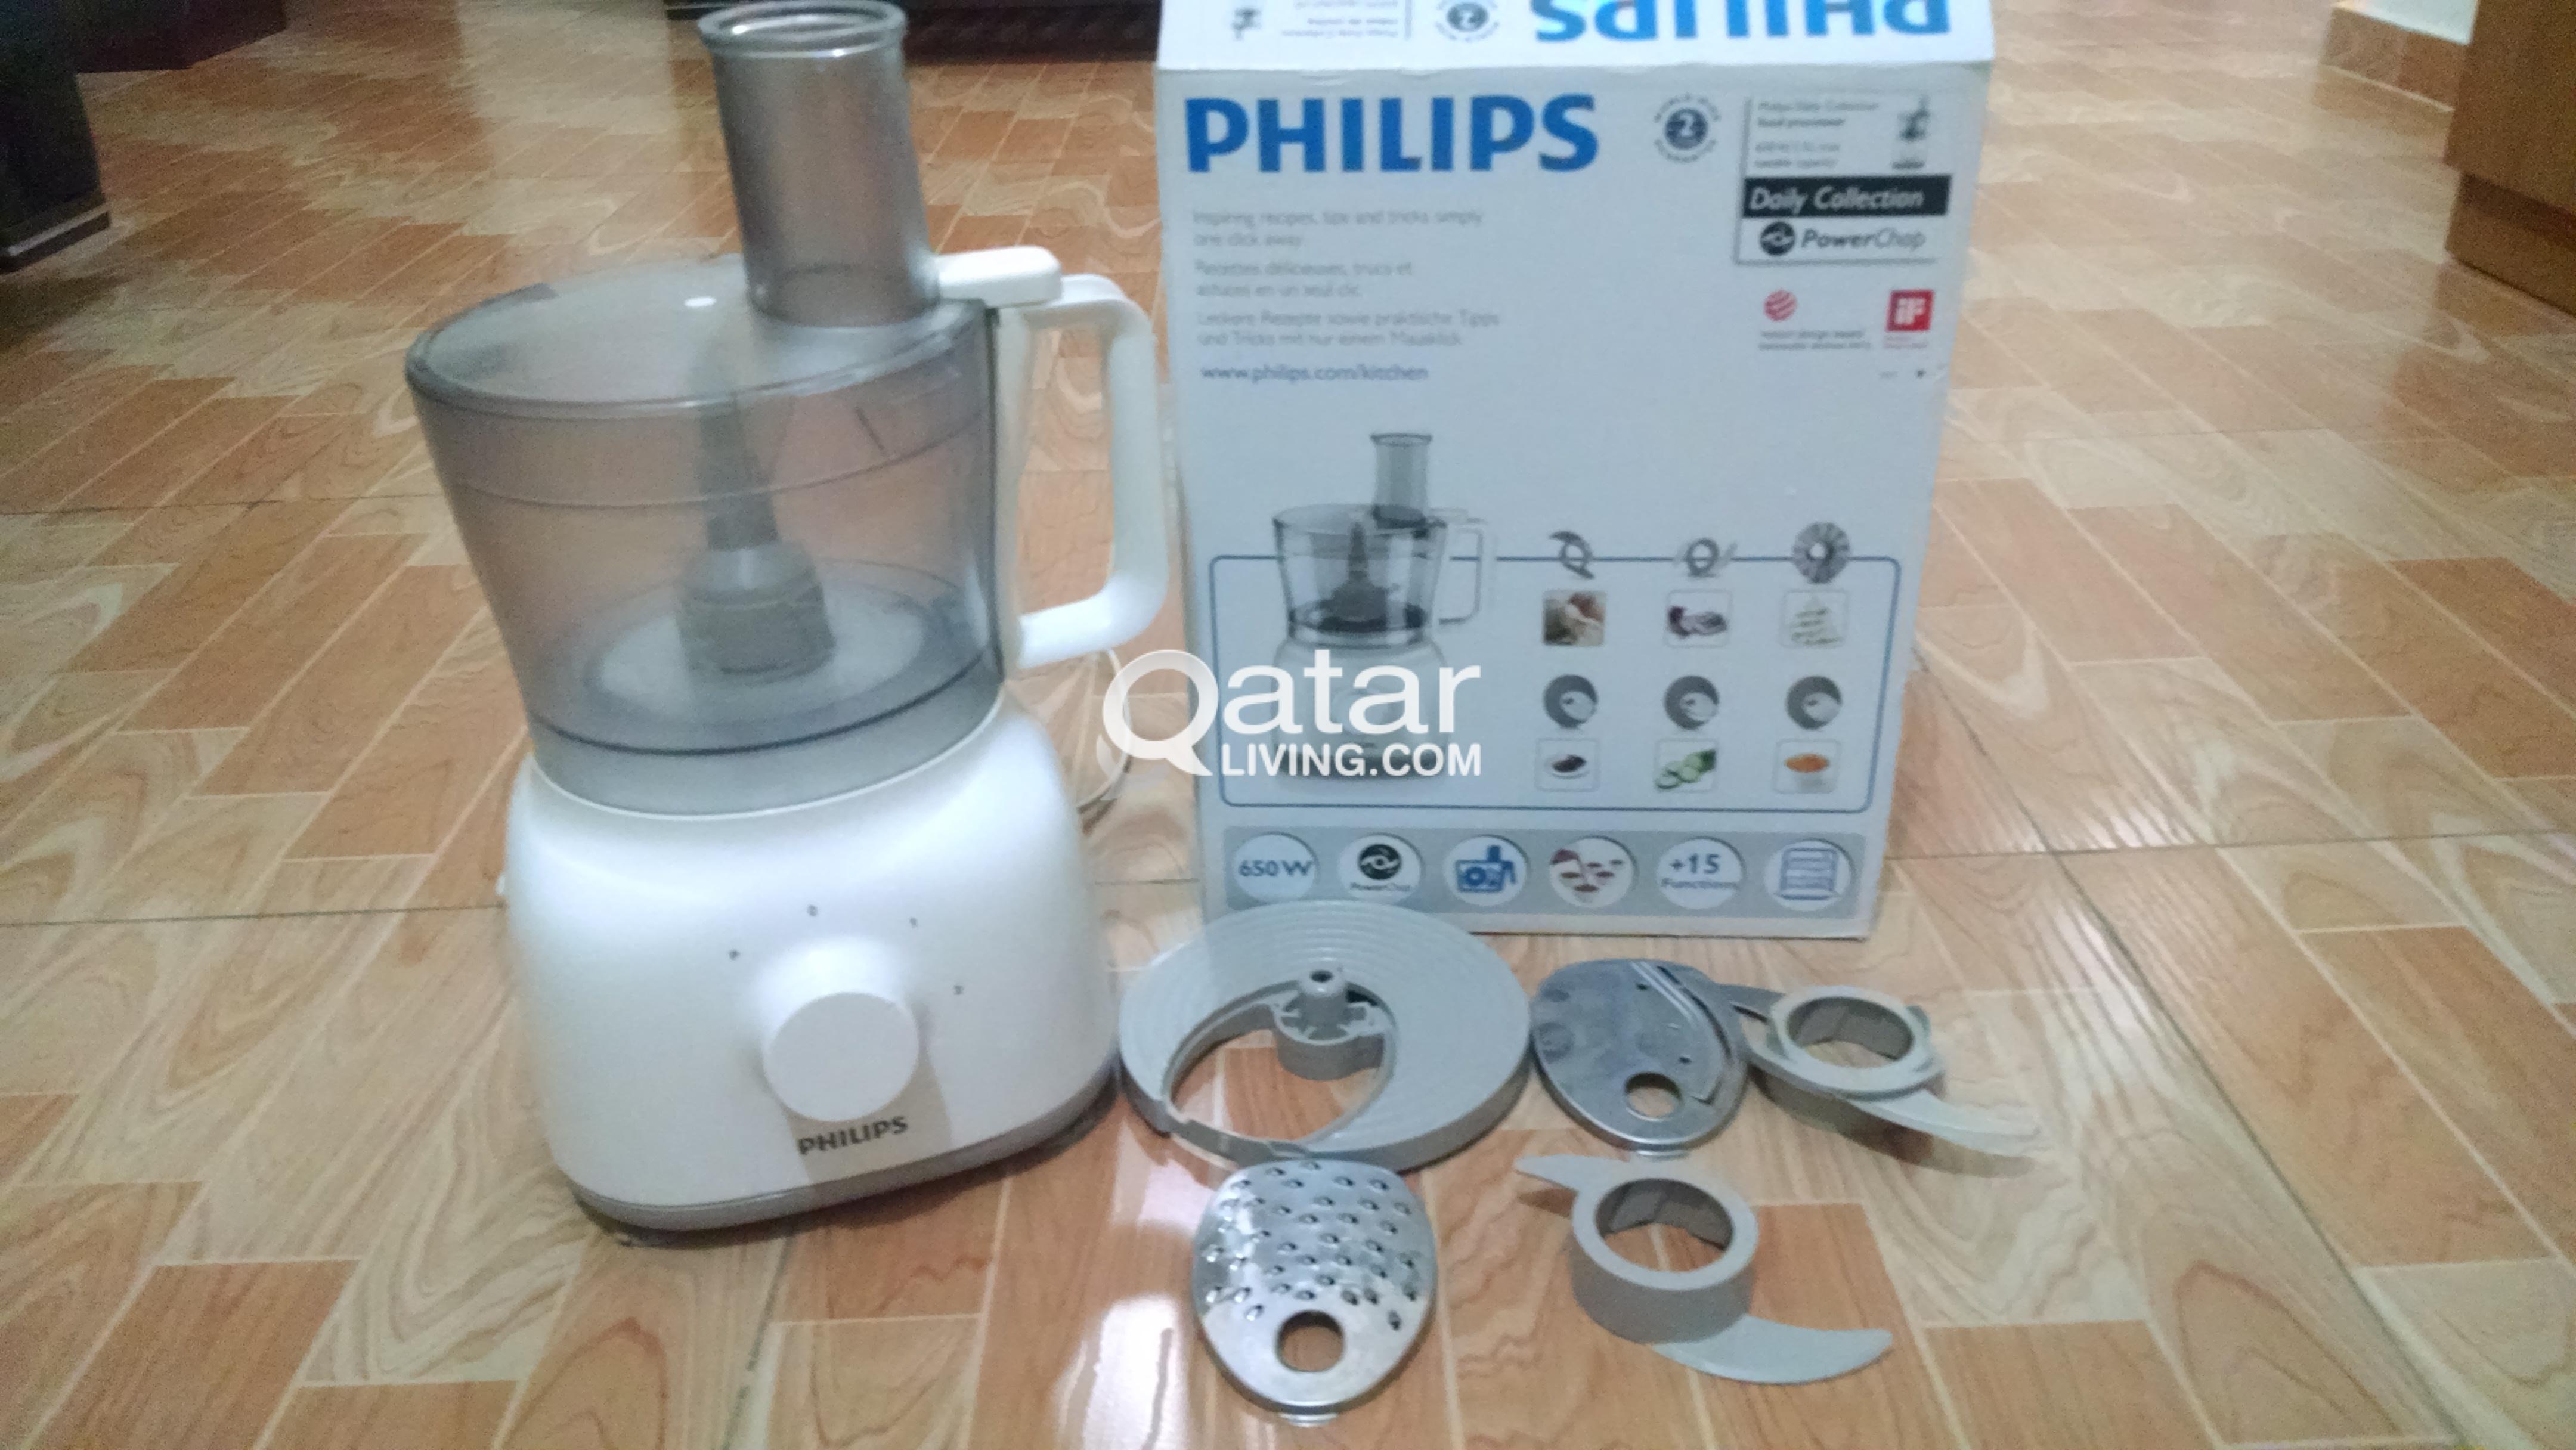 Philips food processor for sale | Qatar Living